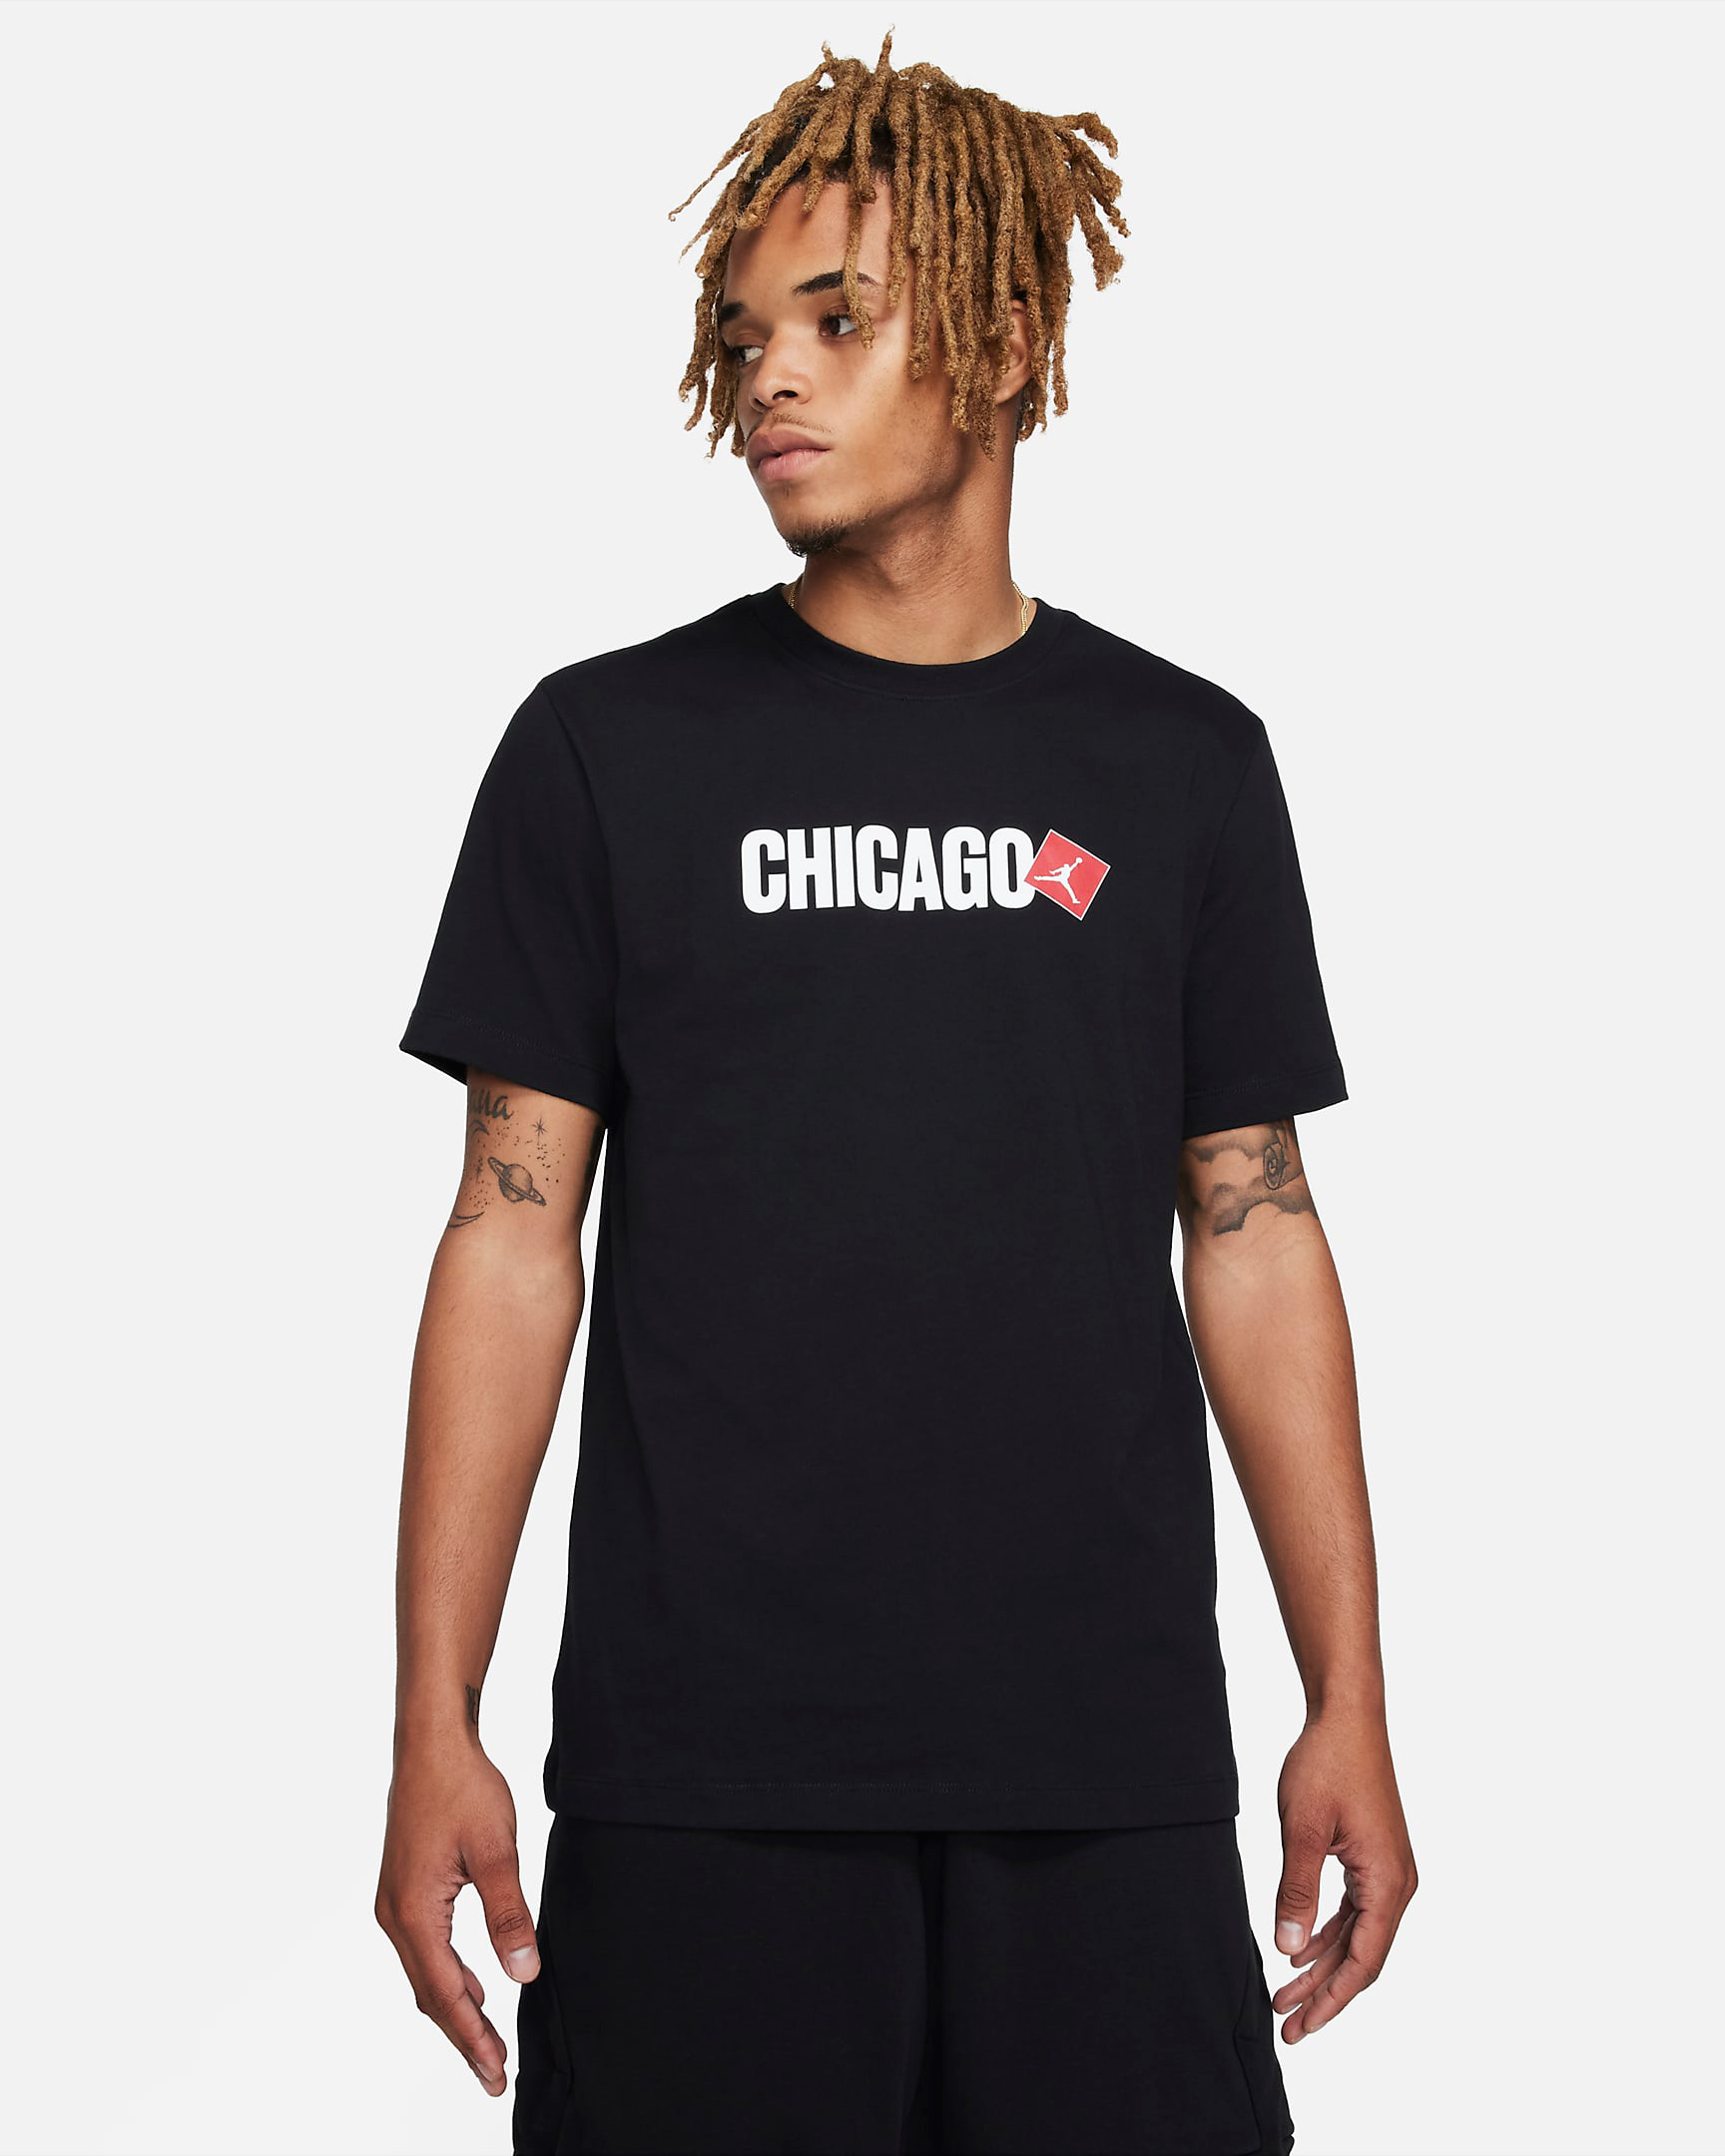 jordan-chicago-shirt-black-2